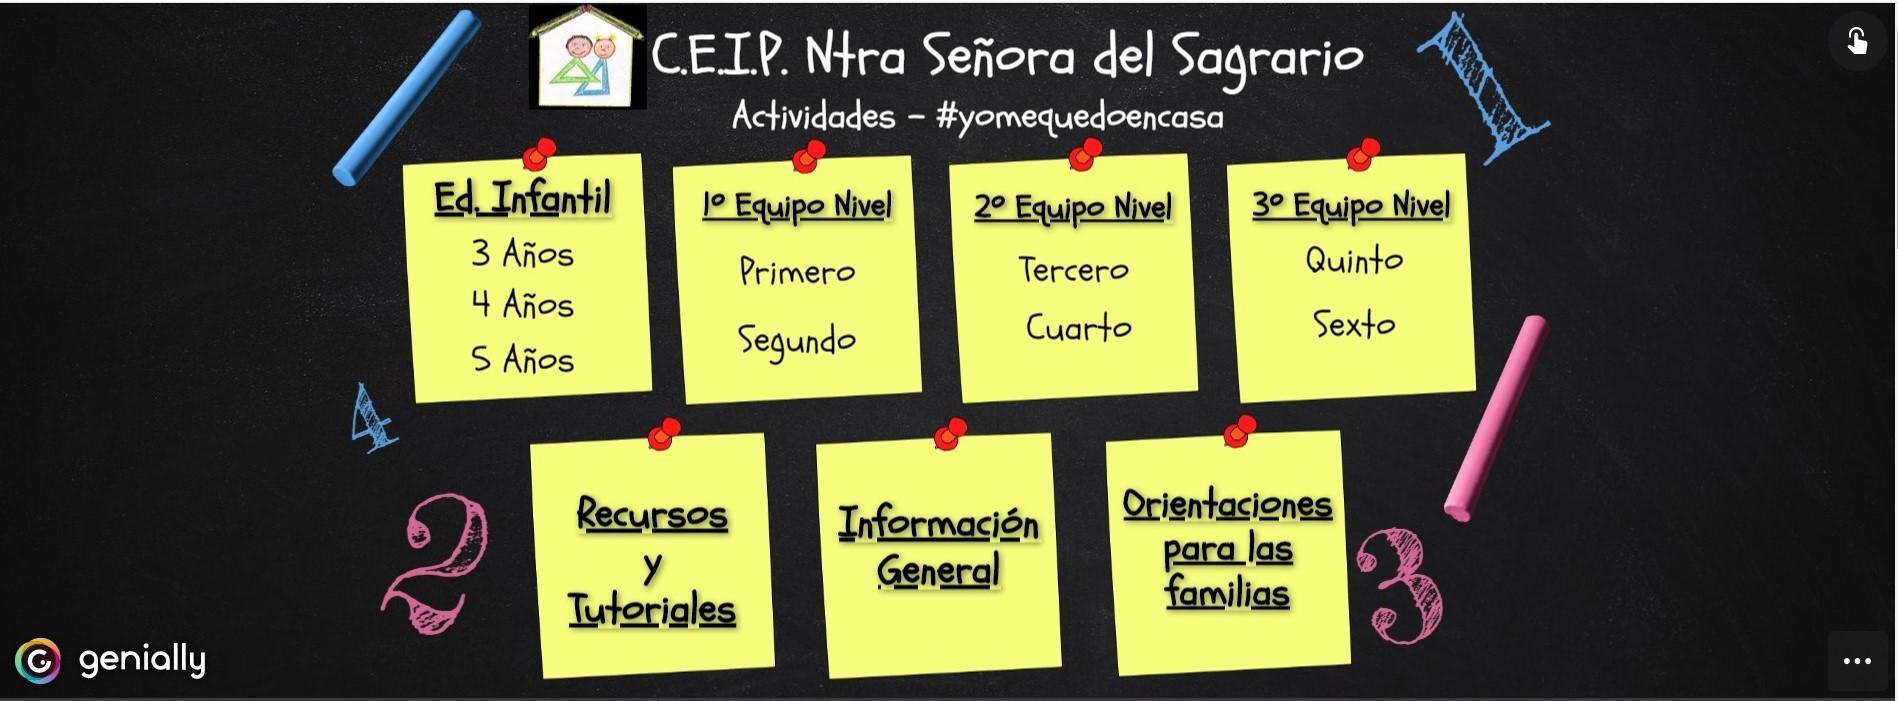 Actividades #Yomequedoencasa